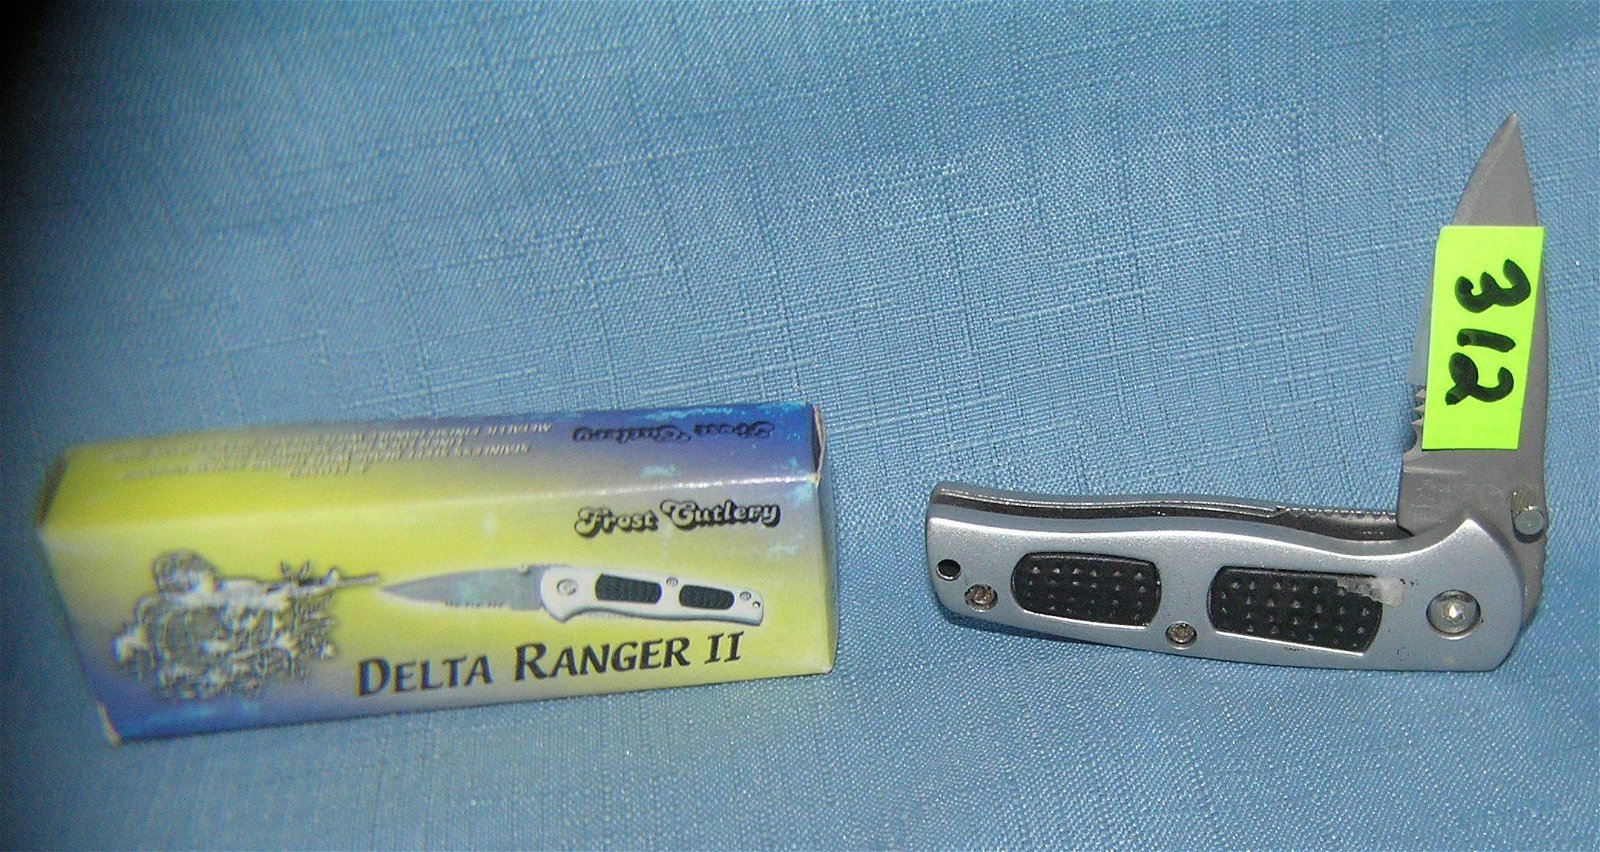 Delta Ranger 2 pocket knife with original box